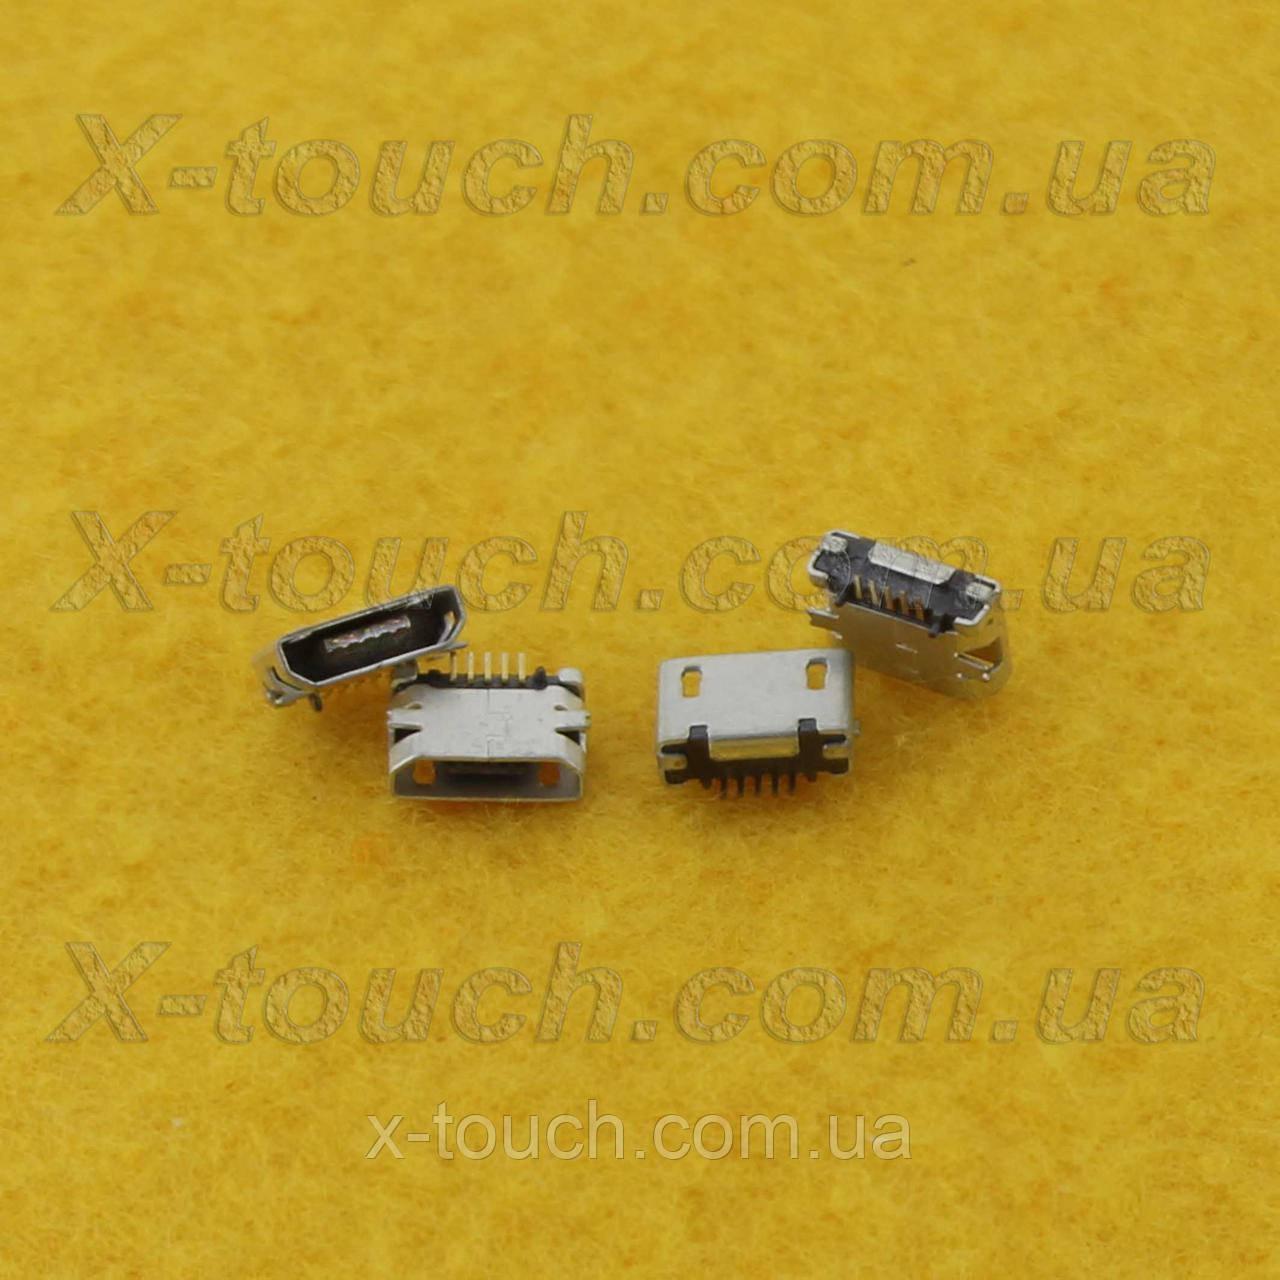 Разъем micro-B USB 5pin с бортиком